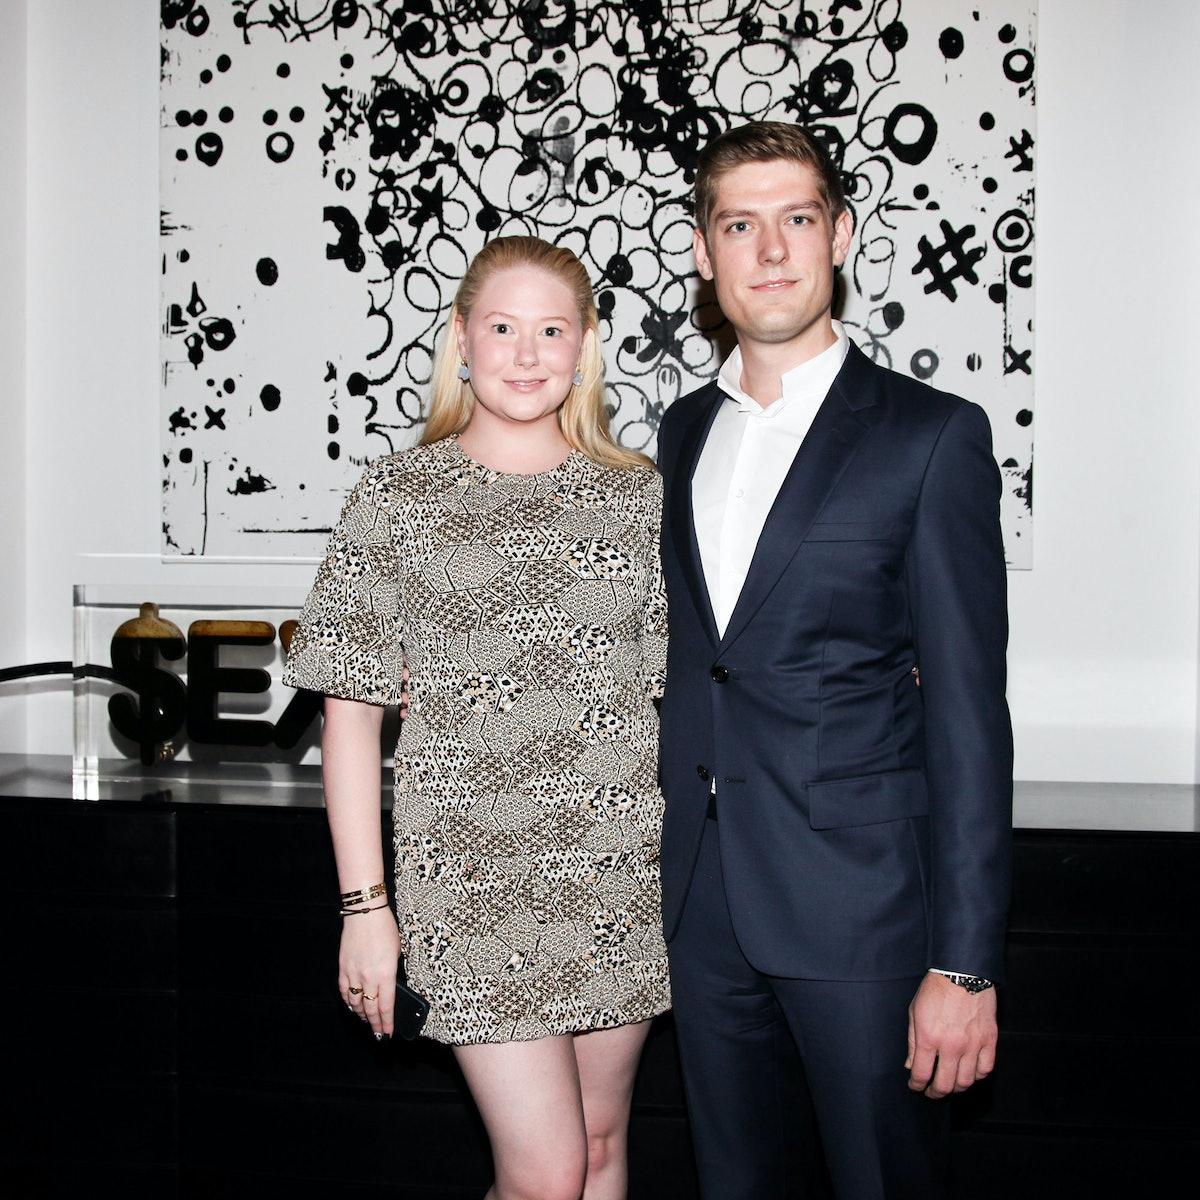 Isabelle Marino and Ryan Hoffman